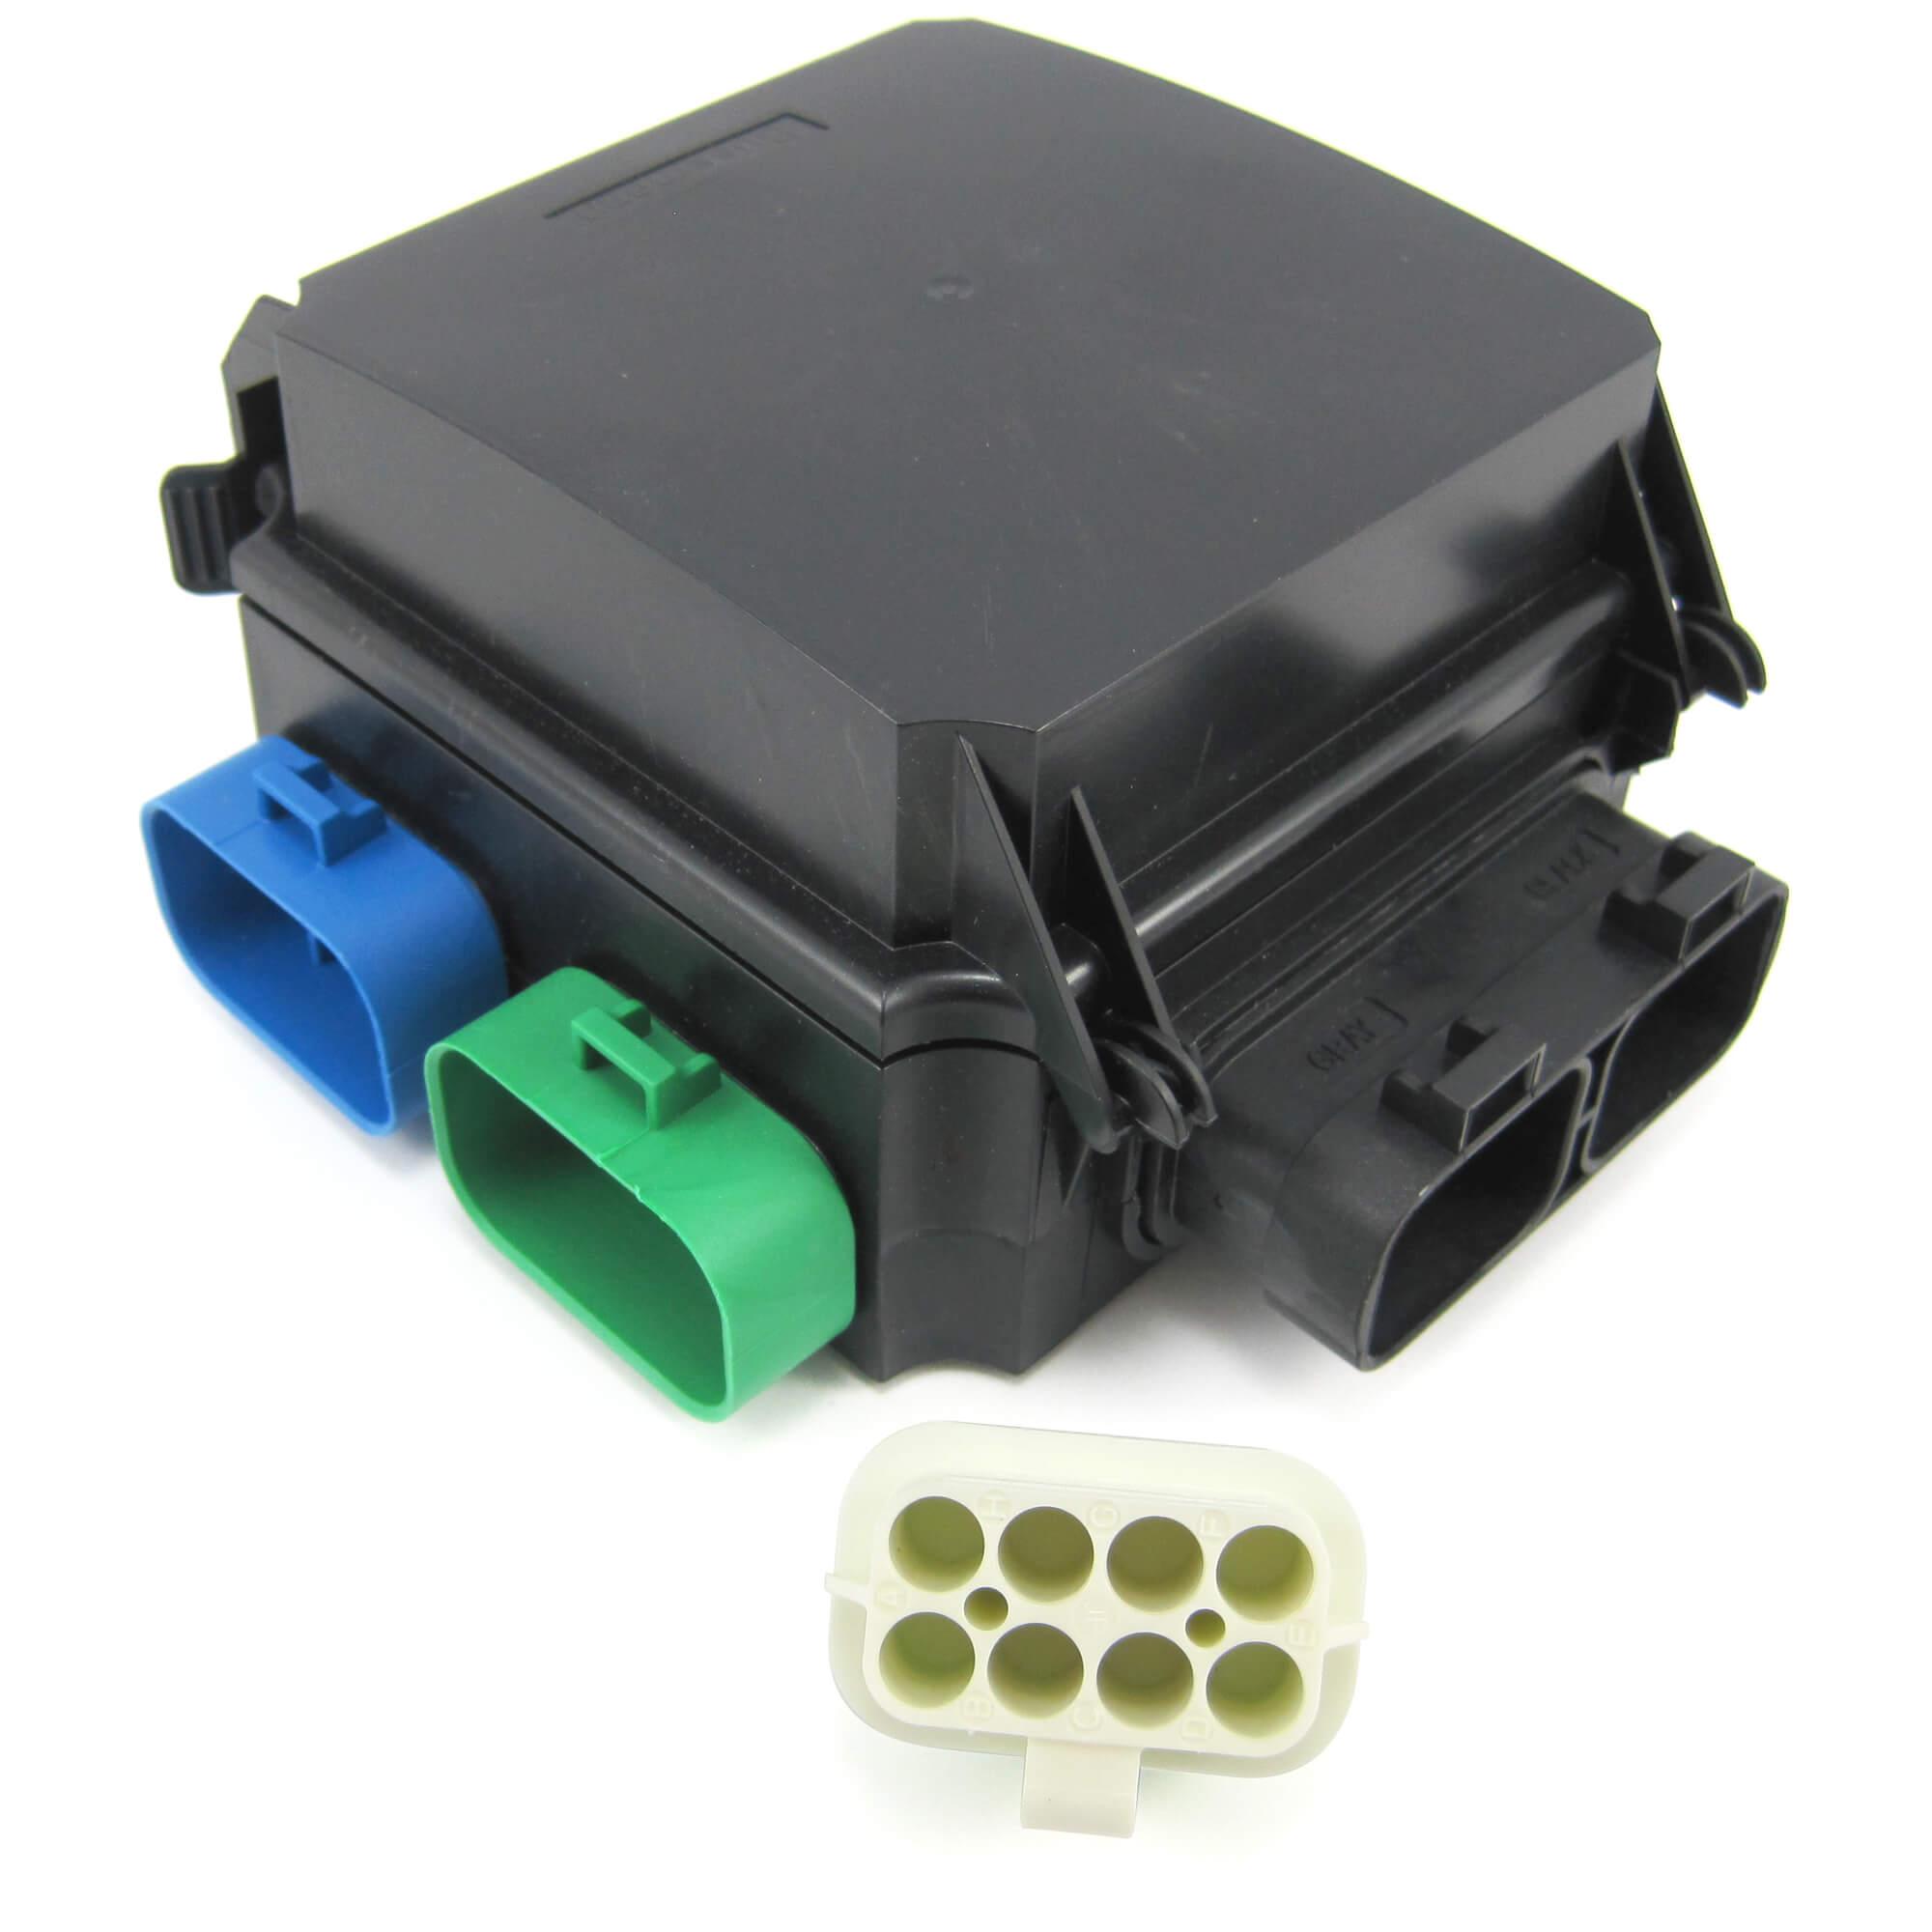 32395?width=547&etag=%22b8c2dff48107009a105ce571865a3a89%22 volvo 3808318 service kit fuse box assembly ebay